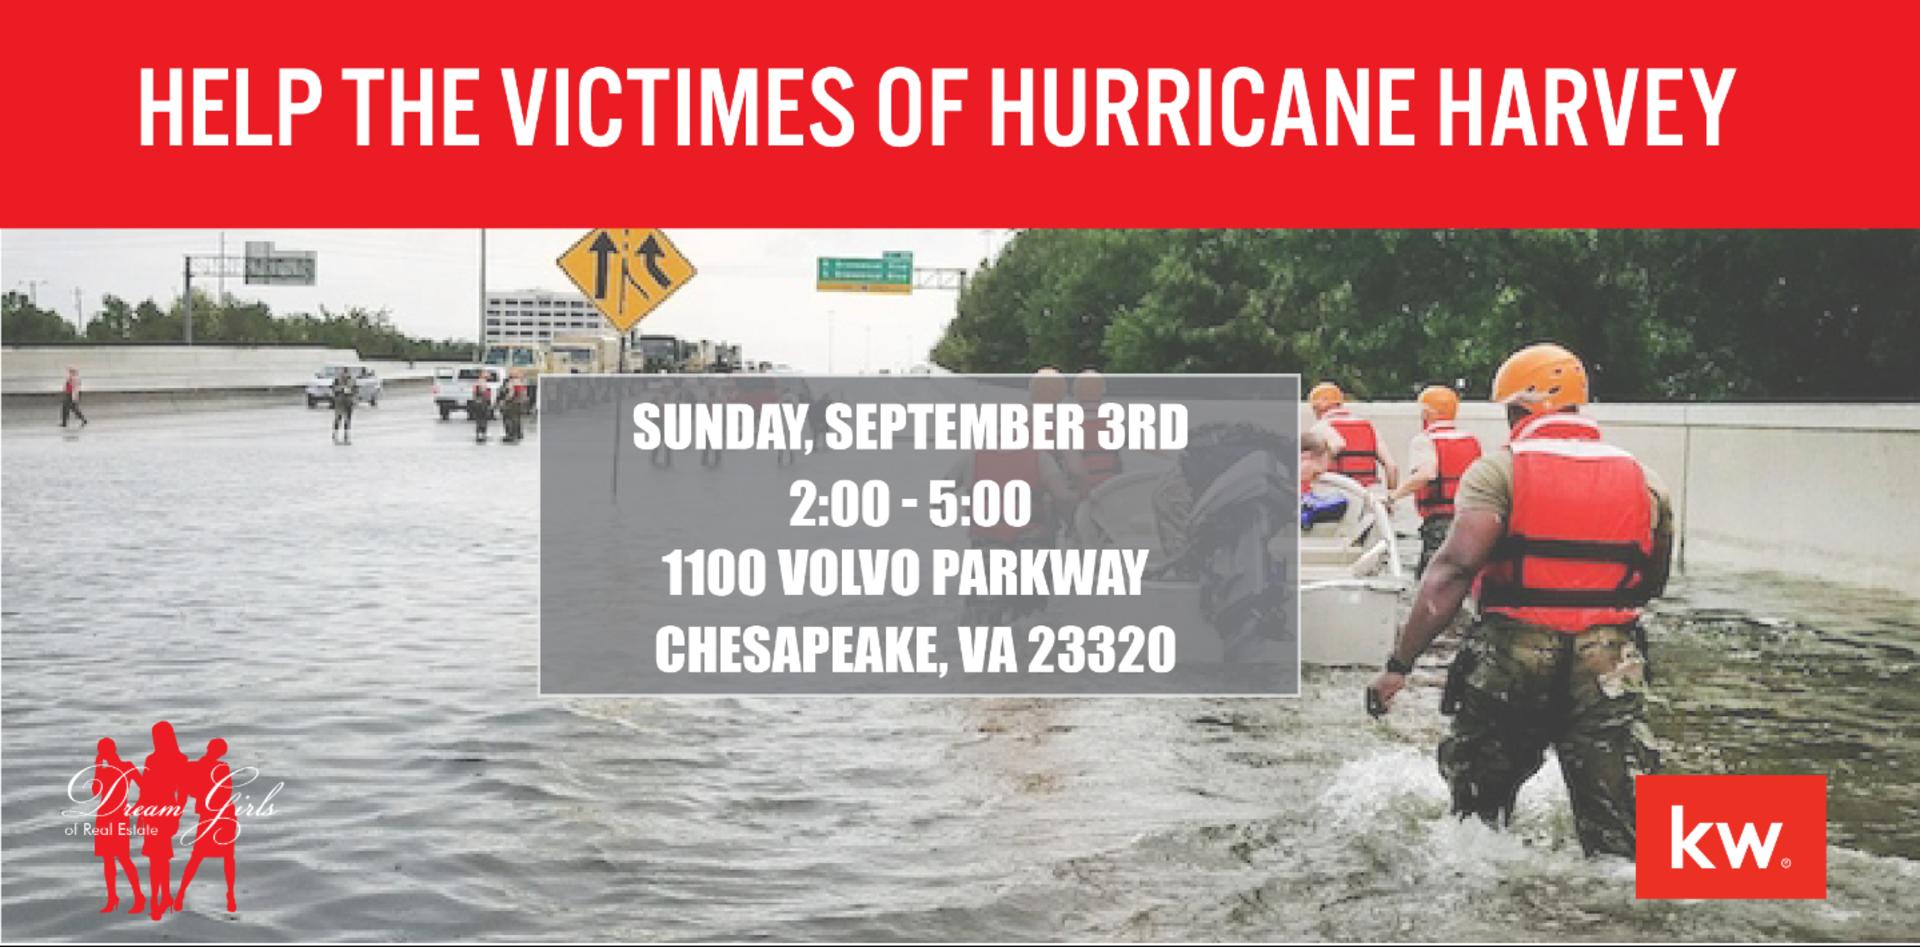 HELP! Hurricane Harvey Victims – THIS Sunday 2-5 pm